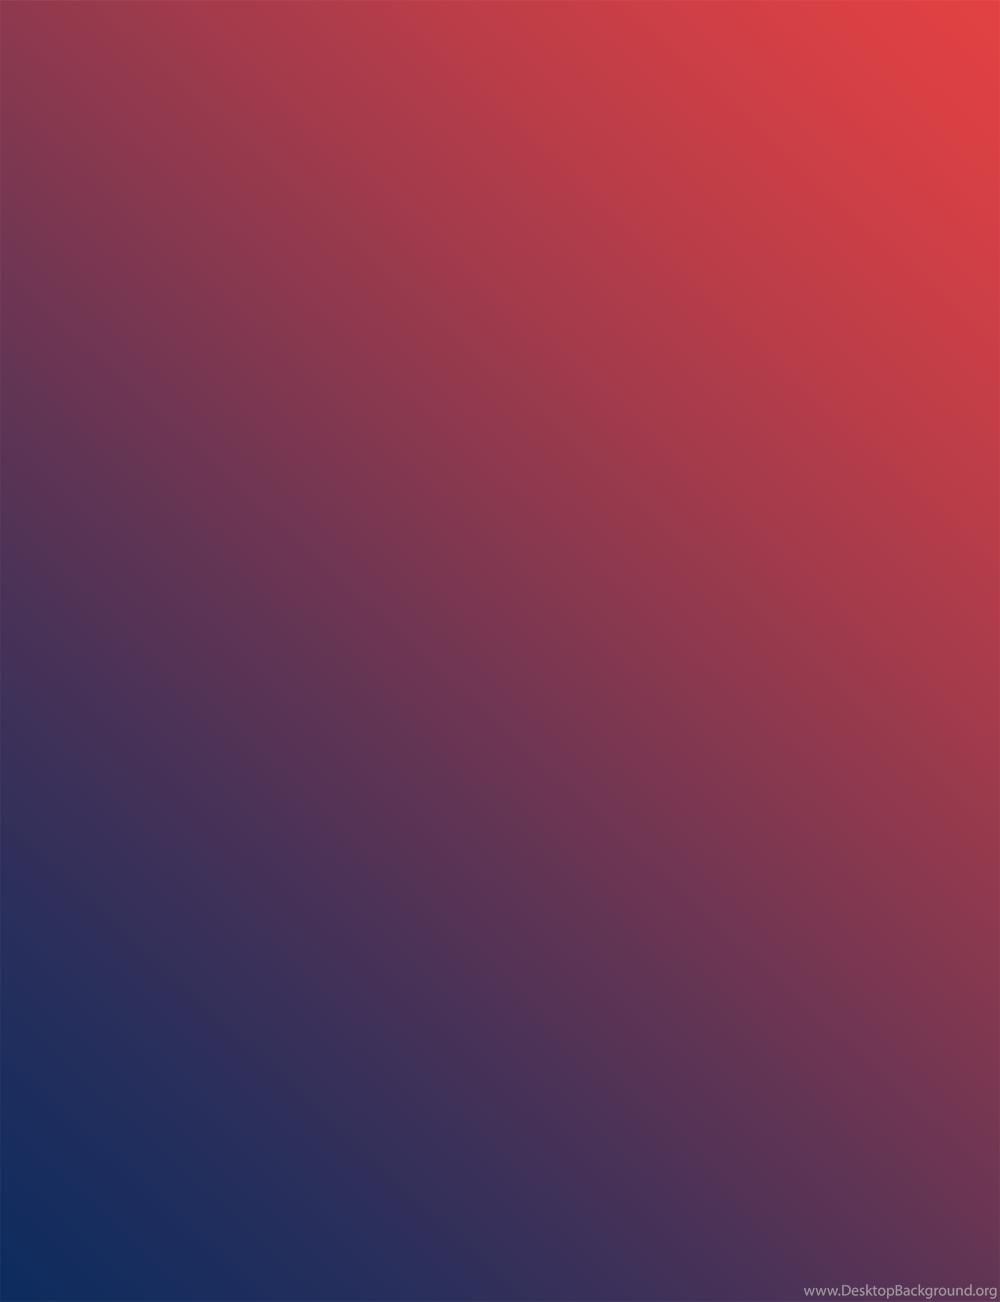 PhoneRebel / Top 10 IOS 9 Cydia Tweaks Part 2 9 0 2 Pangu Compatible